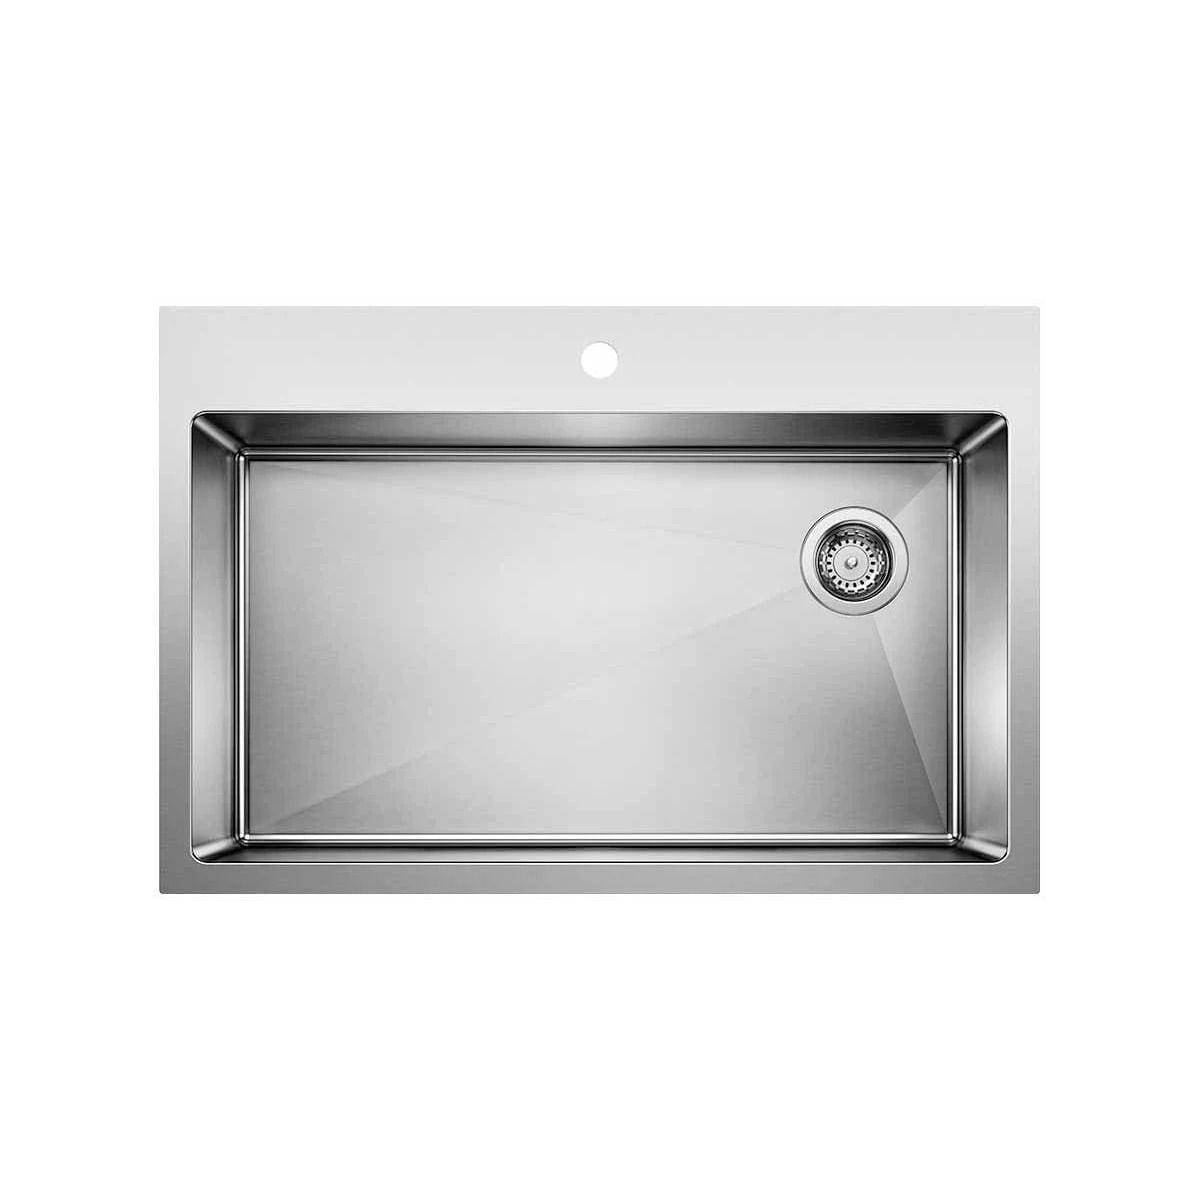 Blanco 524221 Stainless Steel Quatrus 33 X 22 Drop In Undermount Single Basin Kitchen Sink Faucet Com